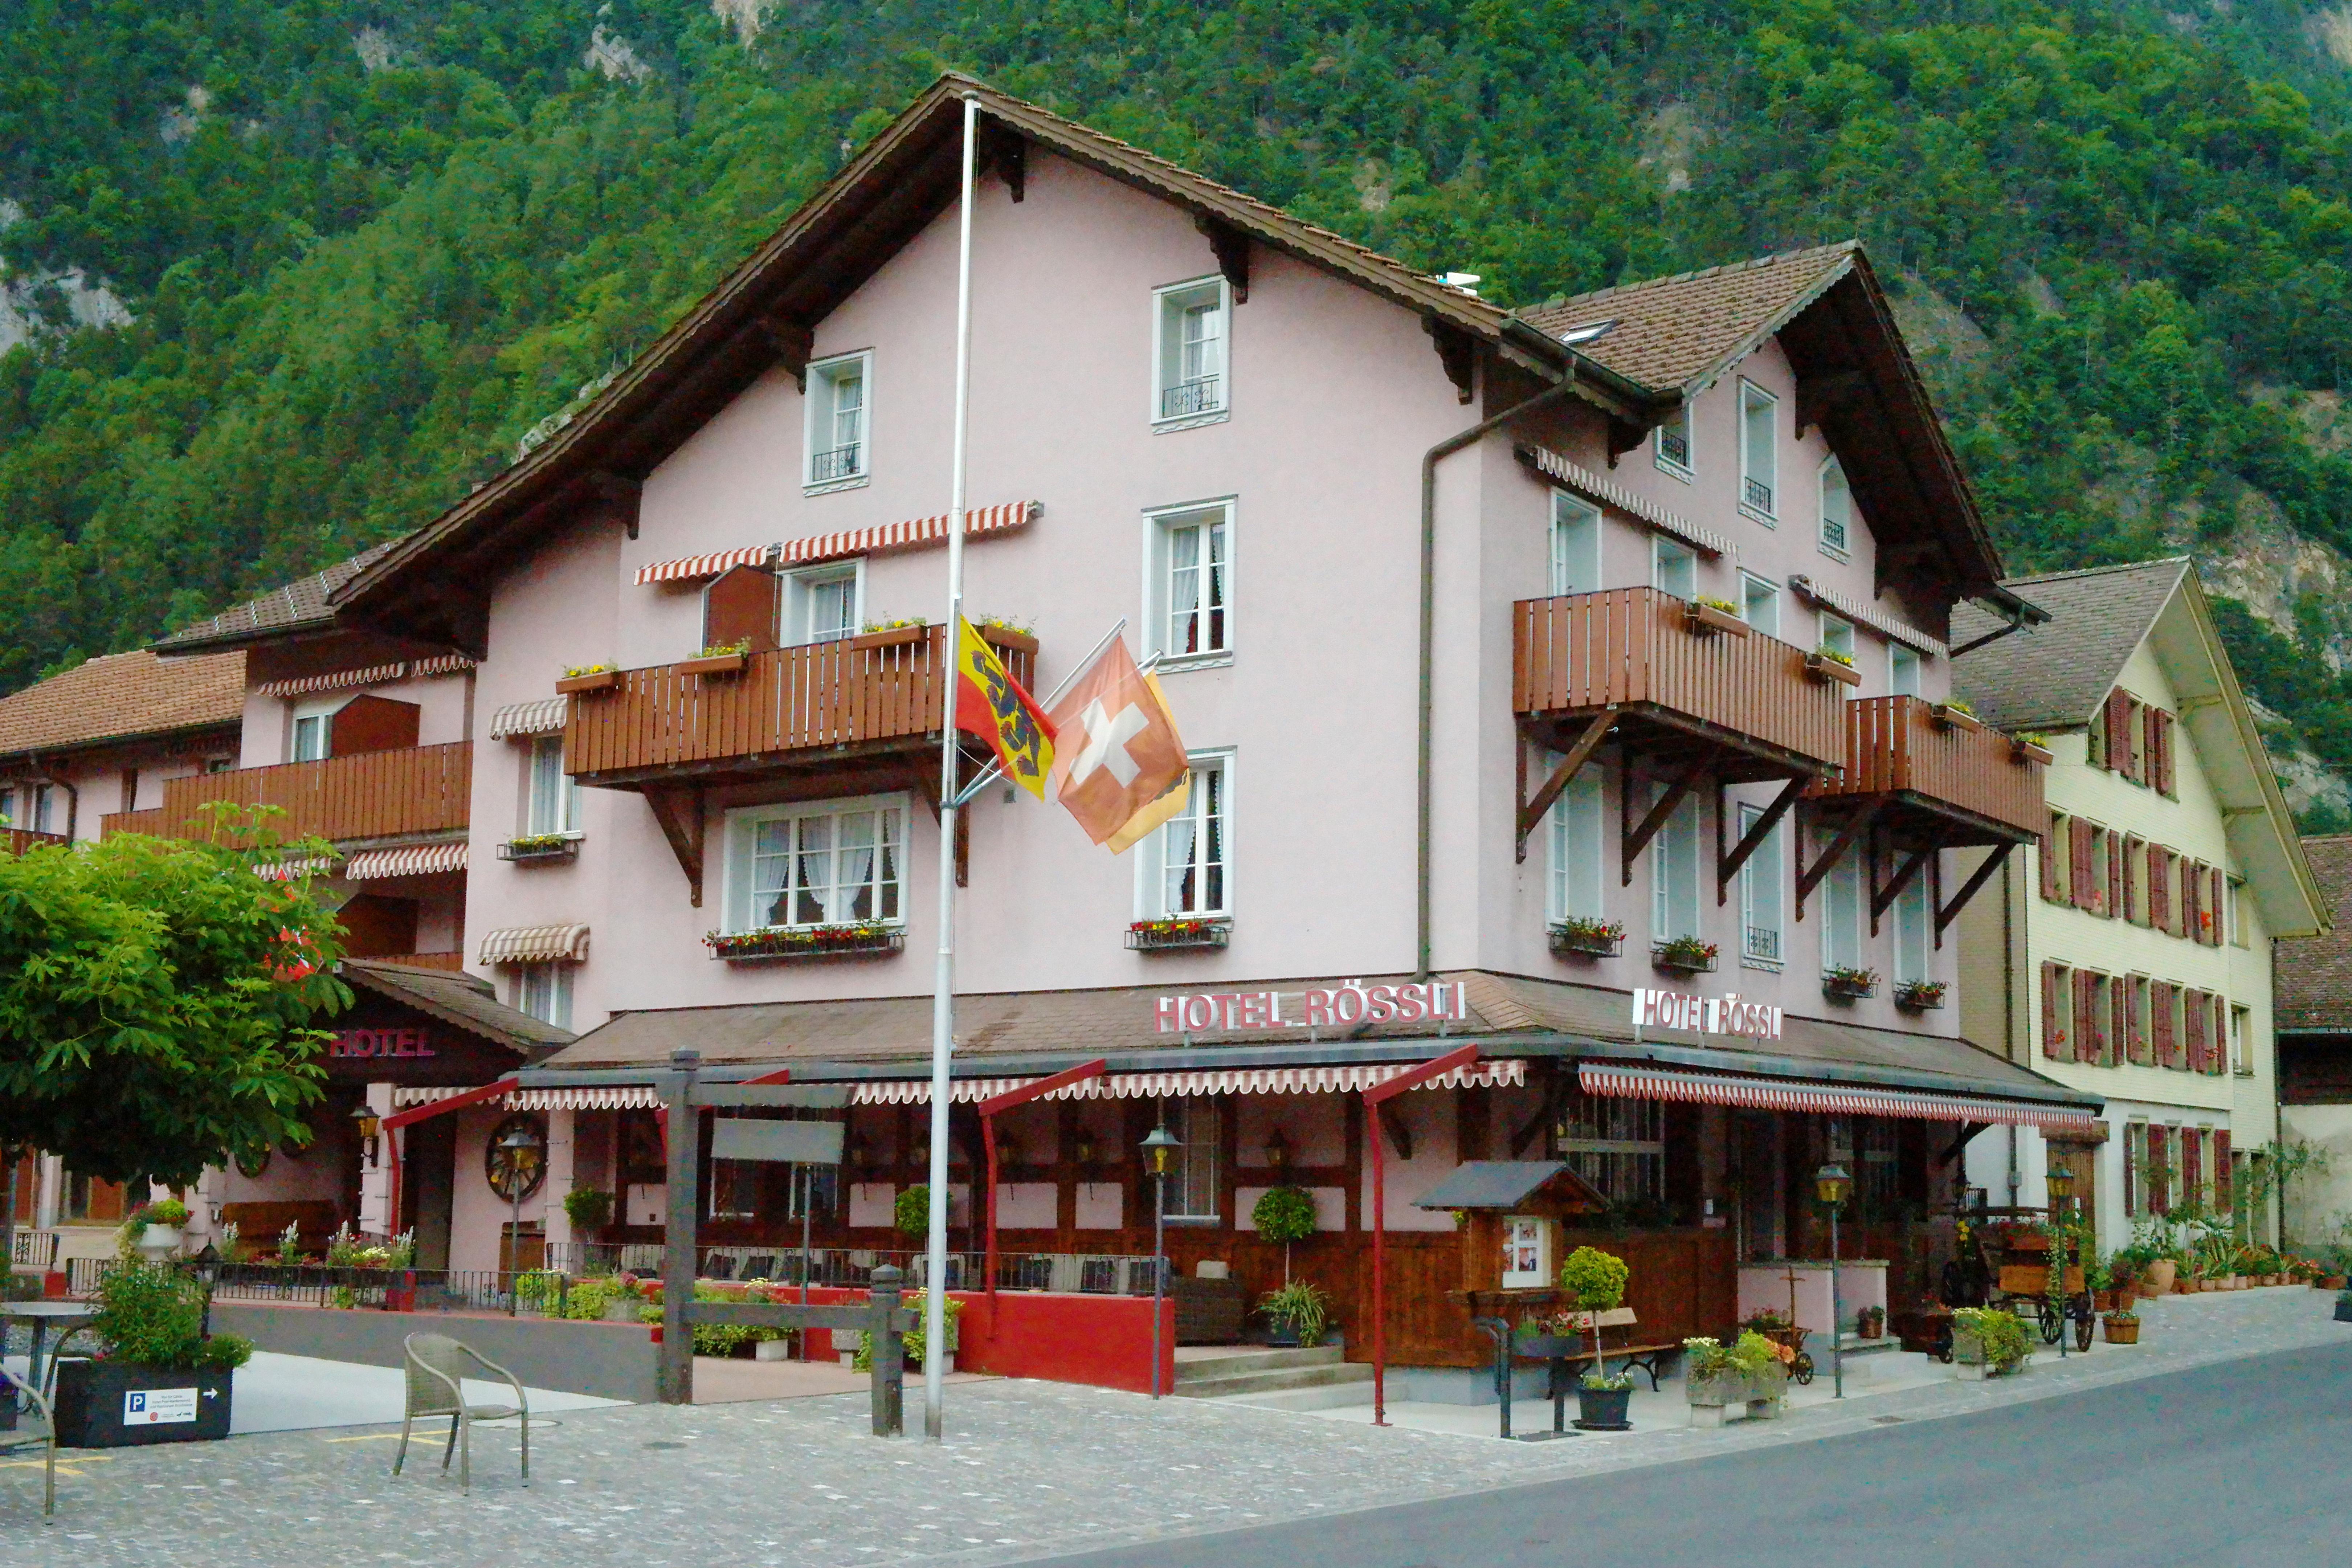 Rössli, Interlaken